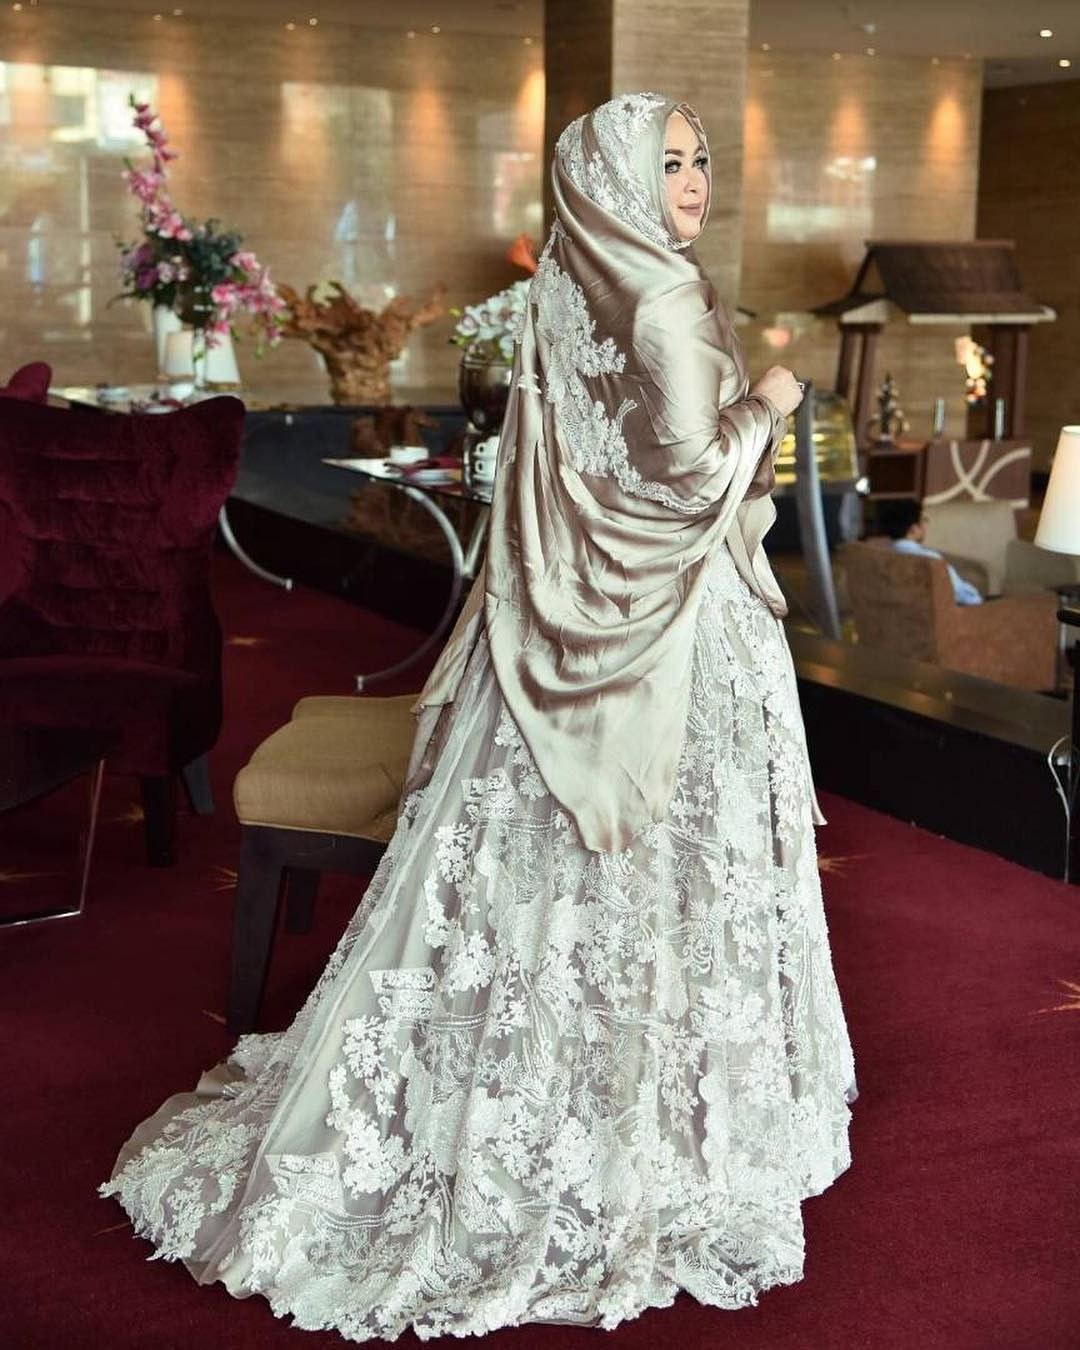 Model Baju Pengantin Muslimah Syar'i 0gdr Gaun Pengantin Syar I Hitam Inspirasi Pernikahan